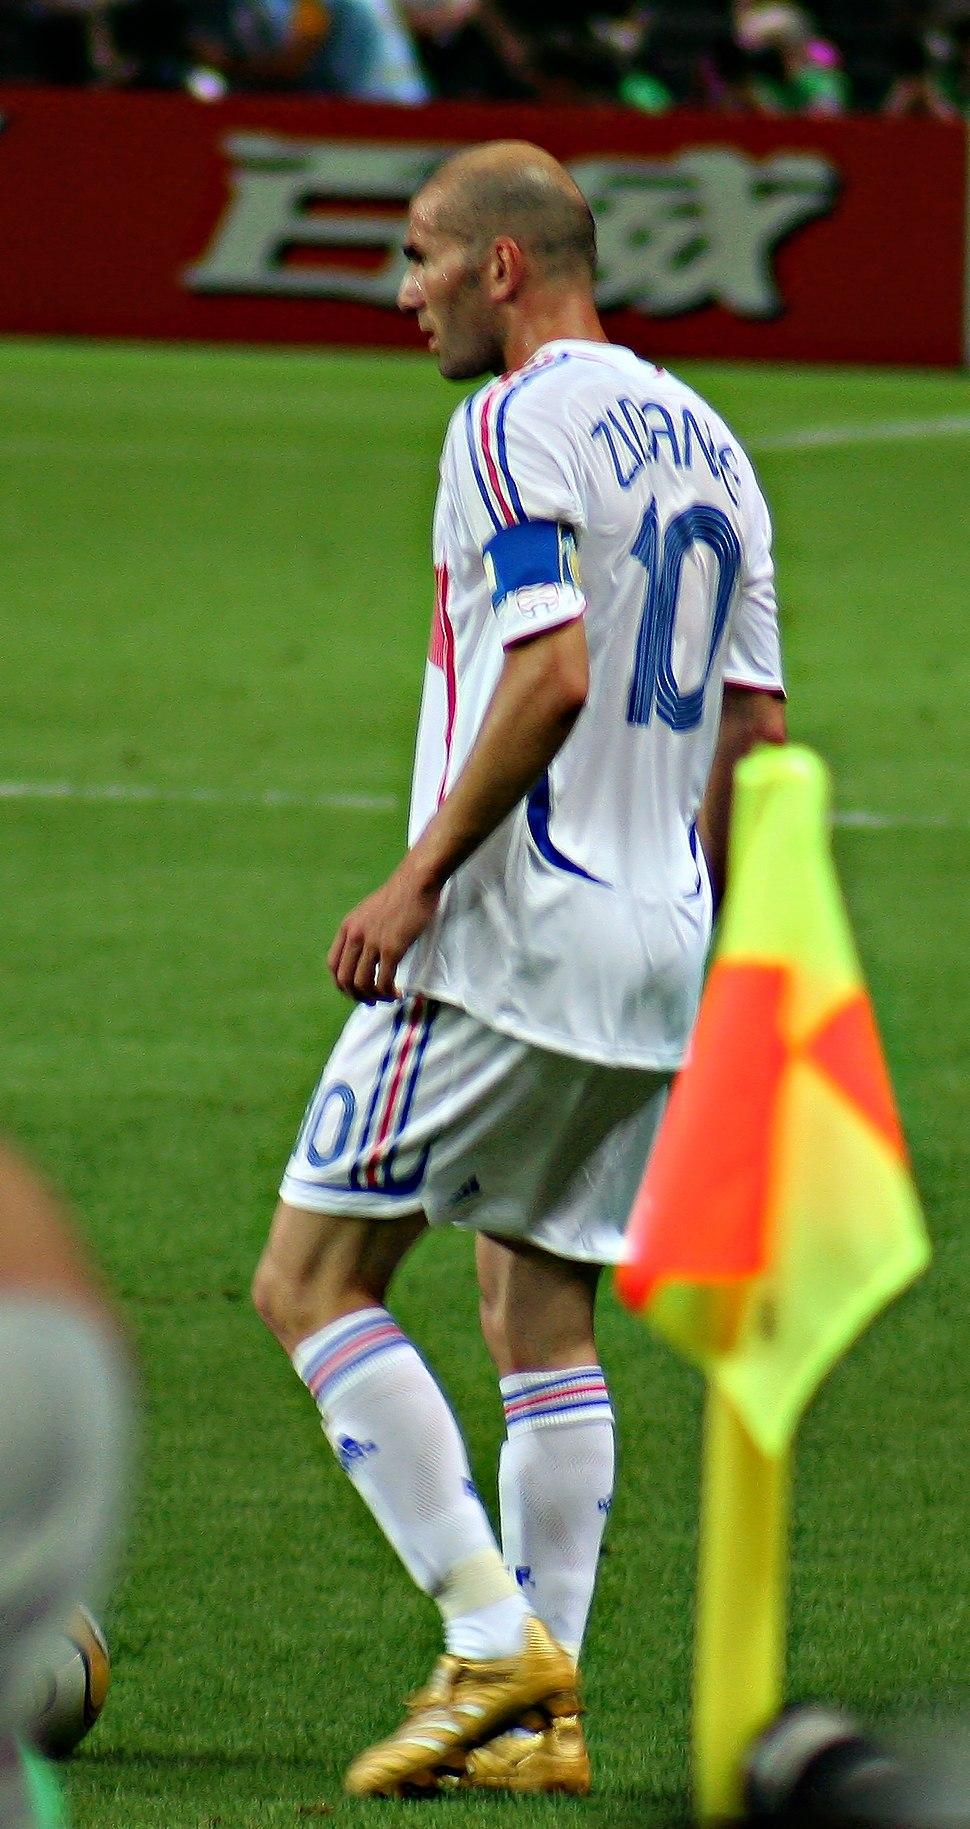 Zinedine zidane wcf 2006-edit